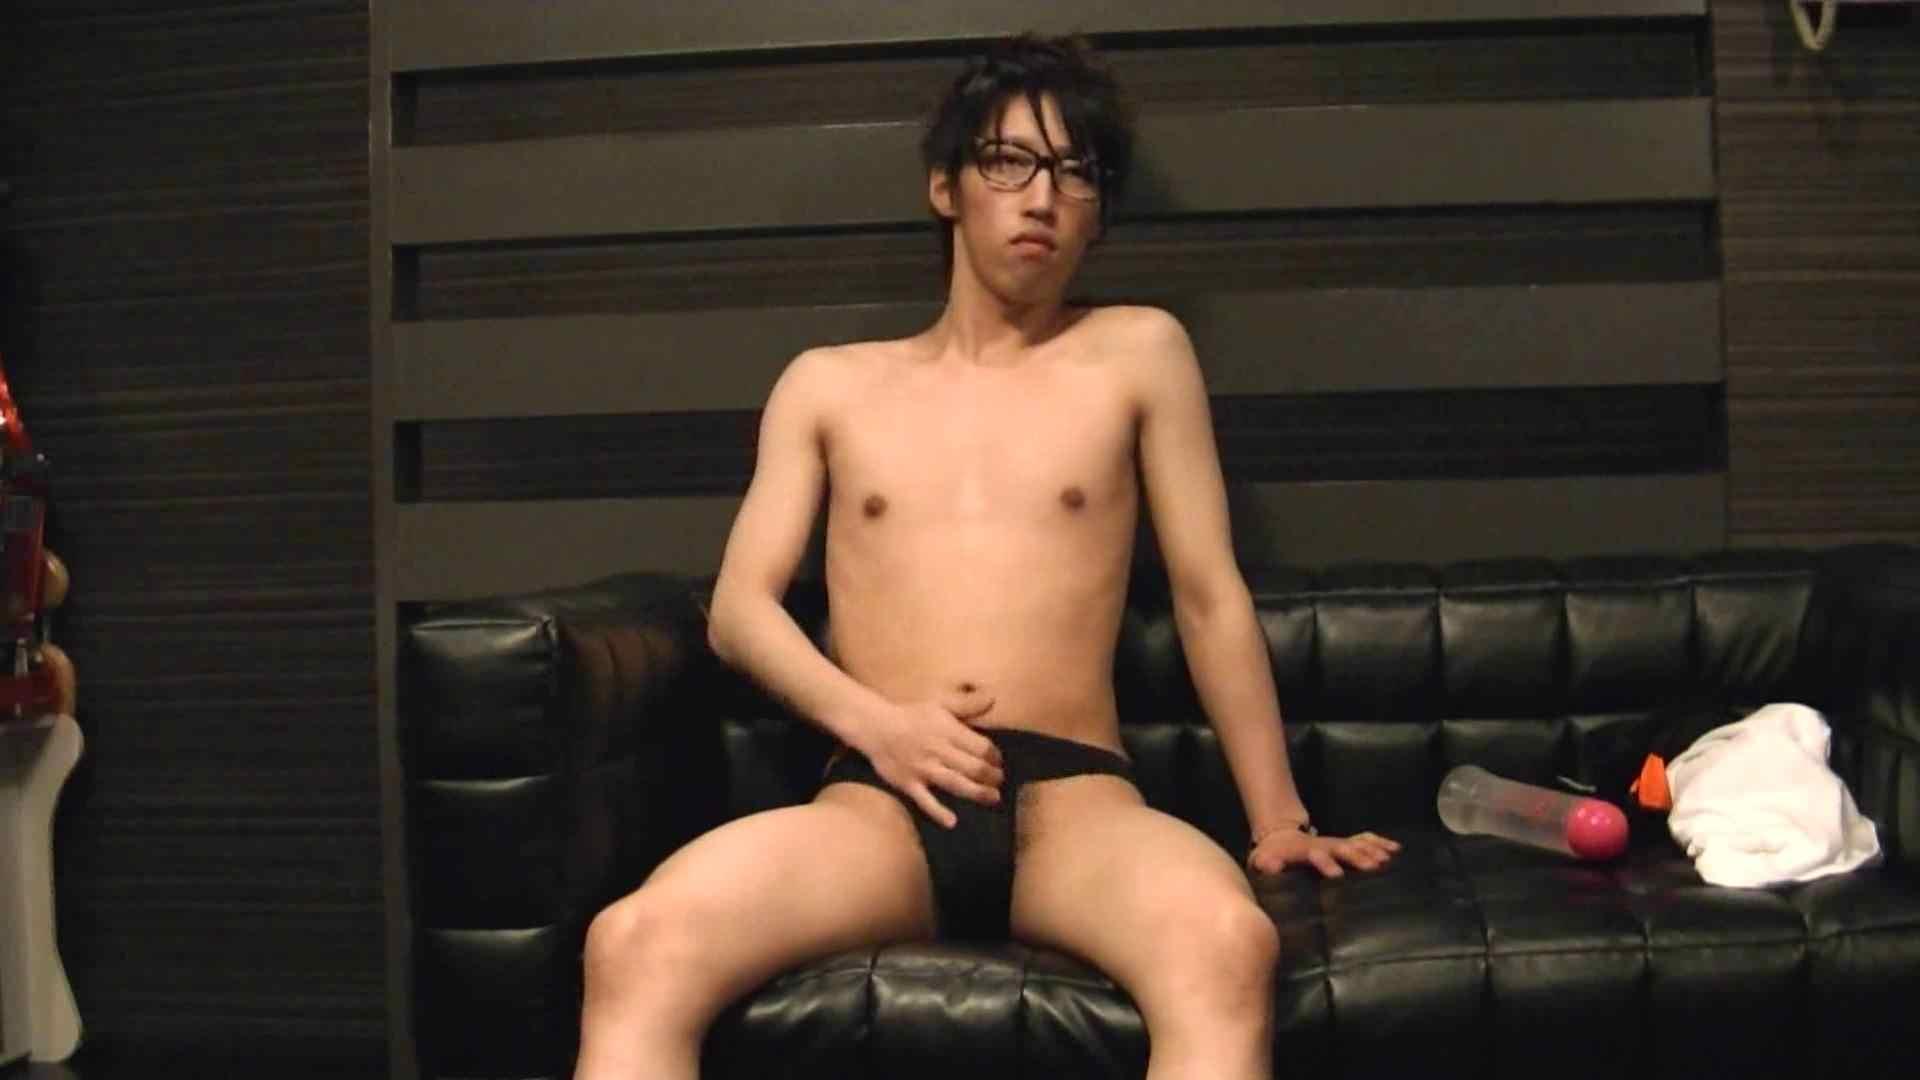 ONA見せカーニバル!! Vol3 男  93pic 5